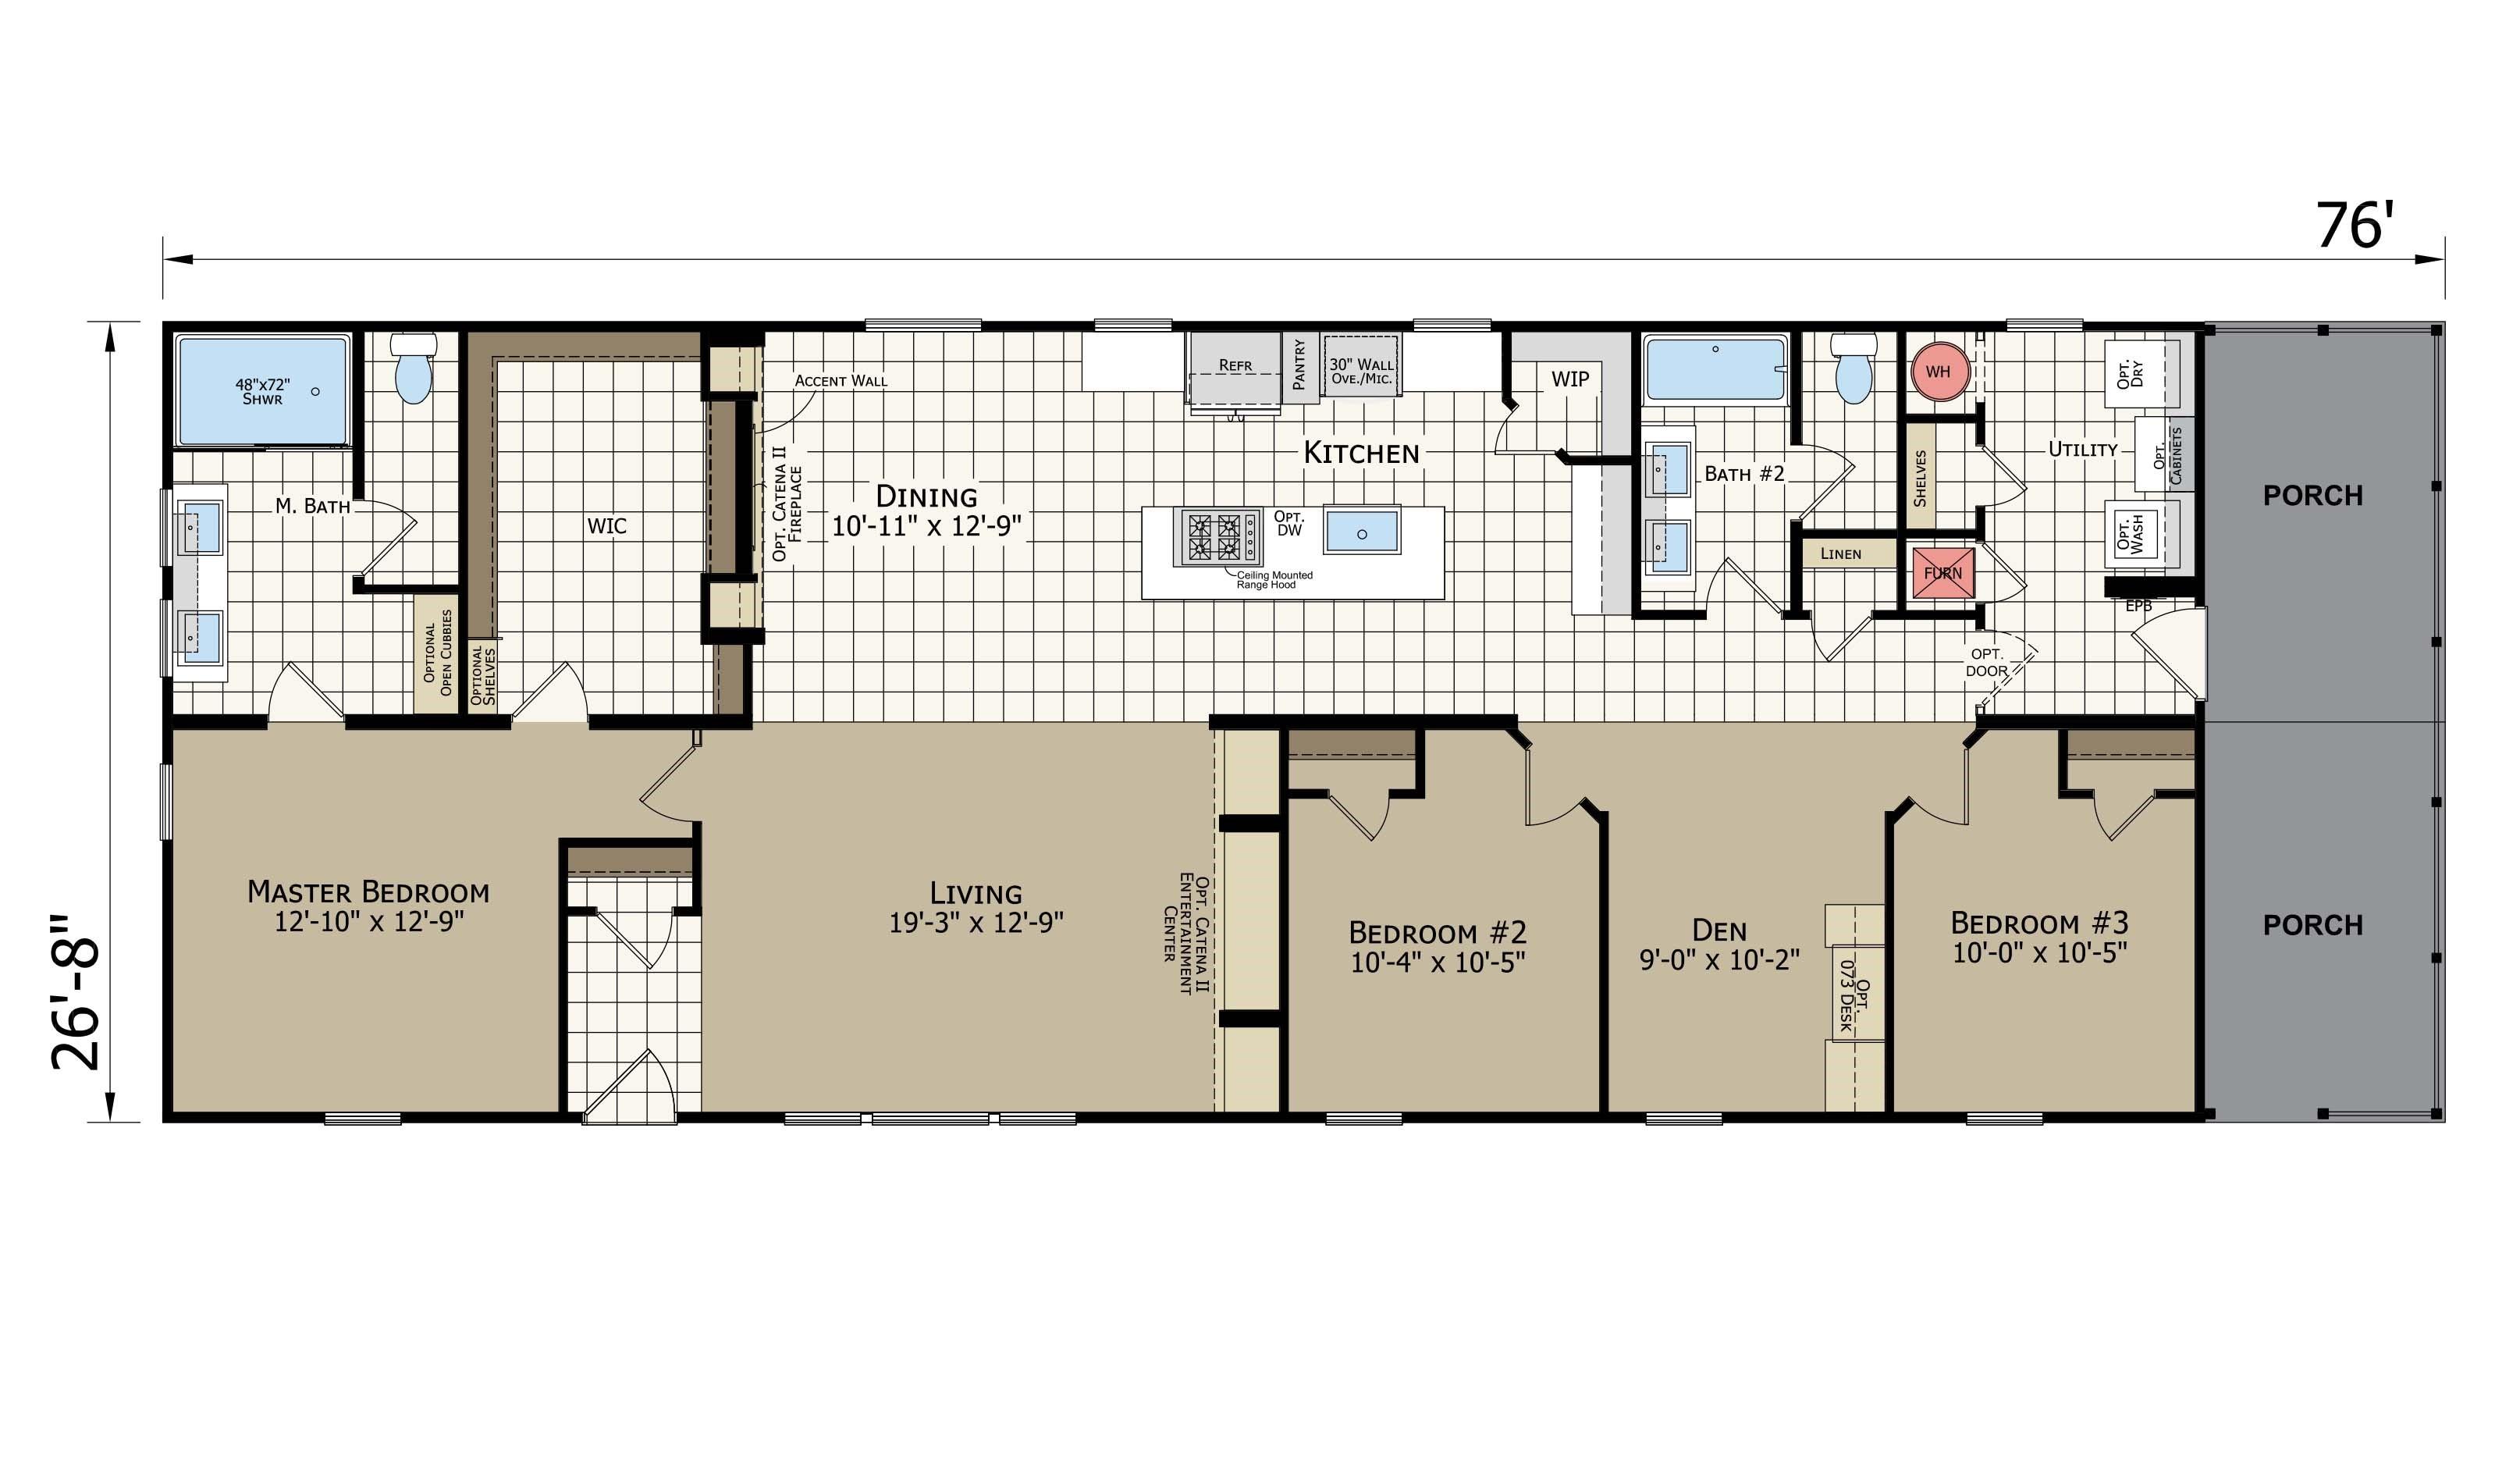 floorplan image for unit 337